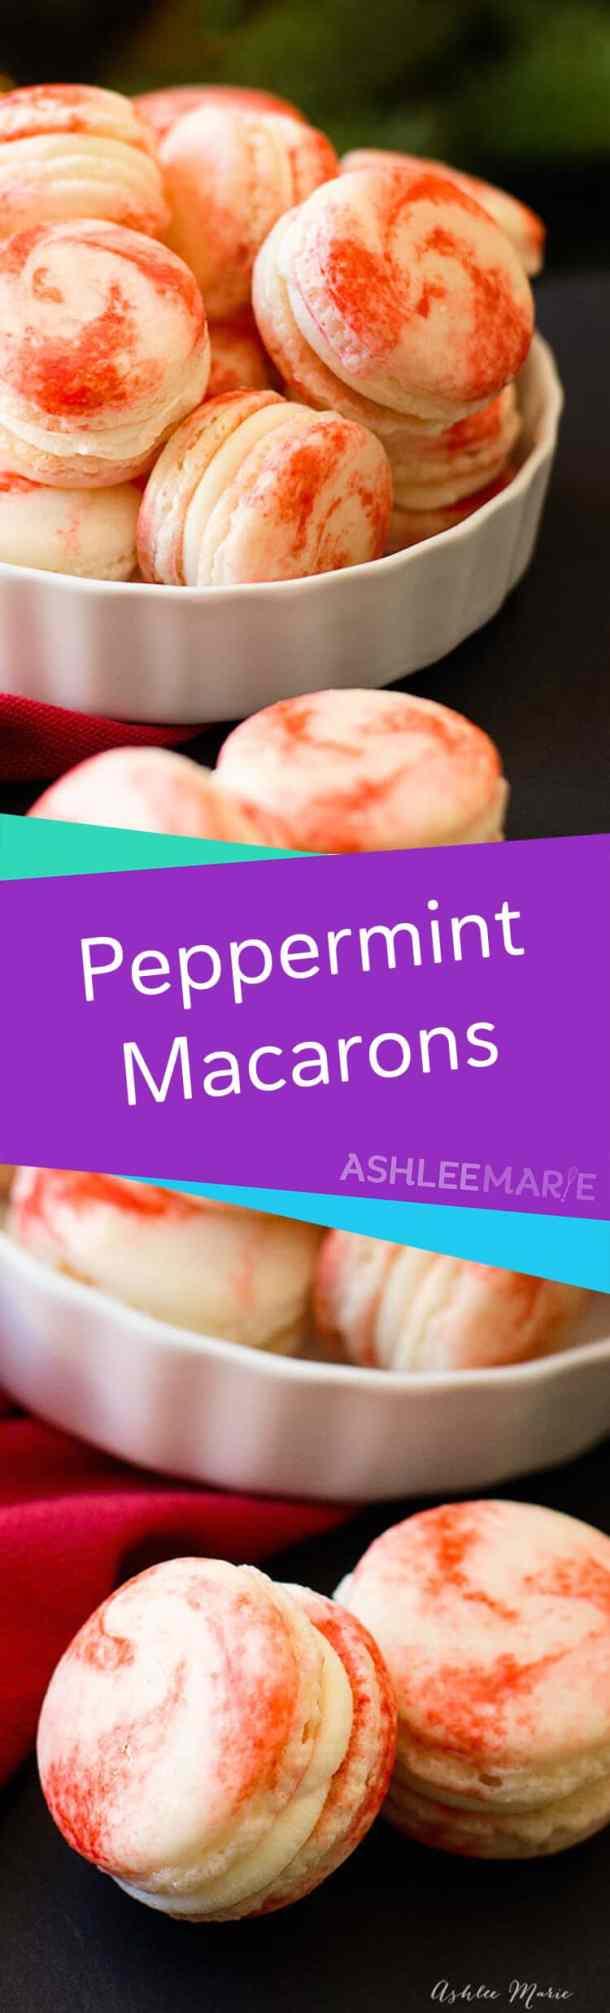 peppermint macaron video tutorial